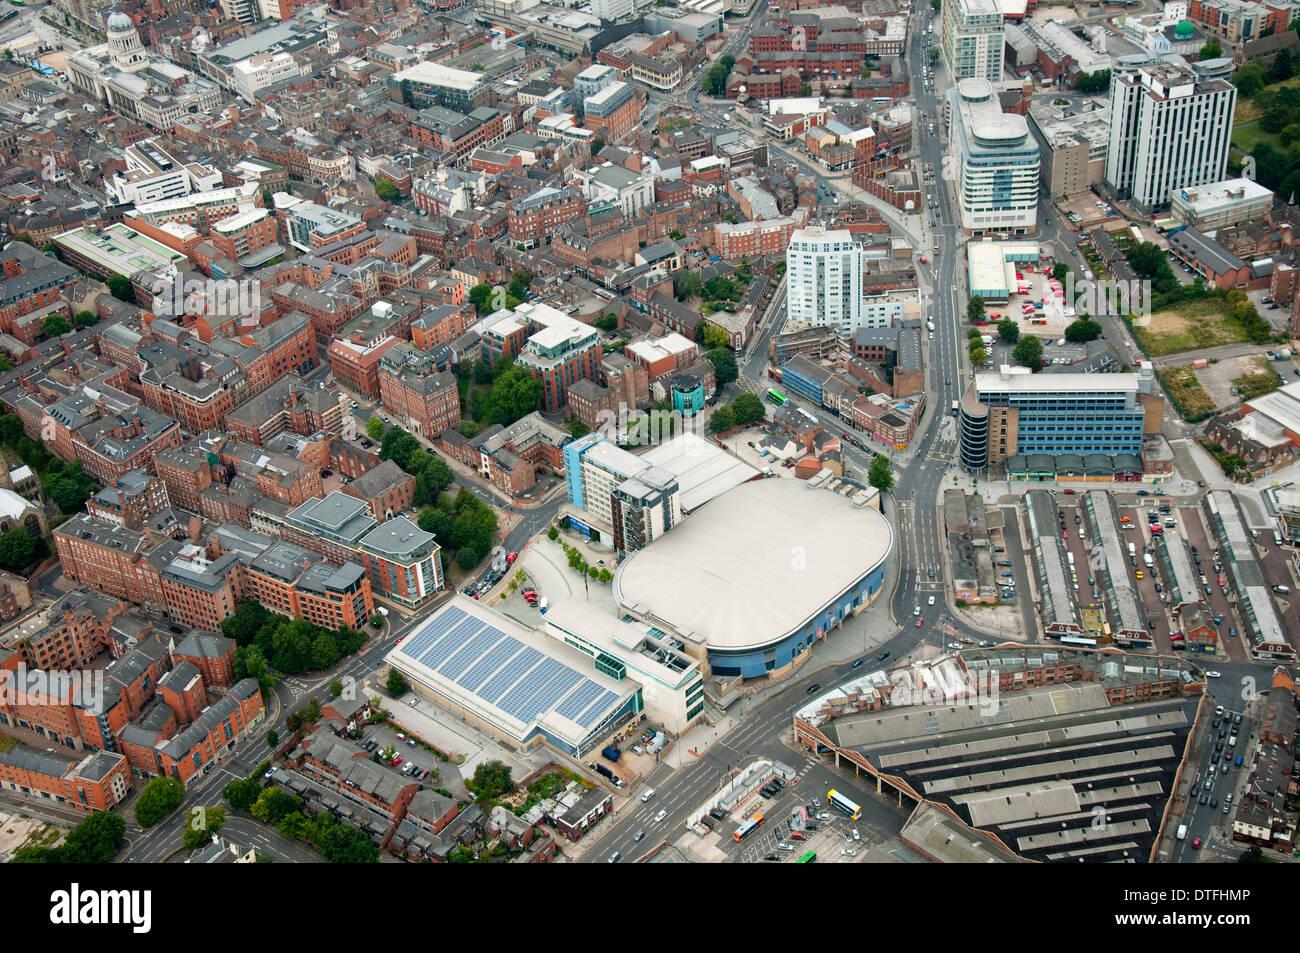 Aerial shot of the National Ice Arena and Nottingham City, Nottinghamshire UK - Stock Image